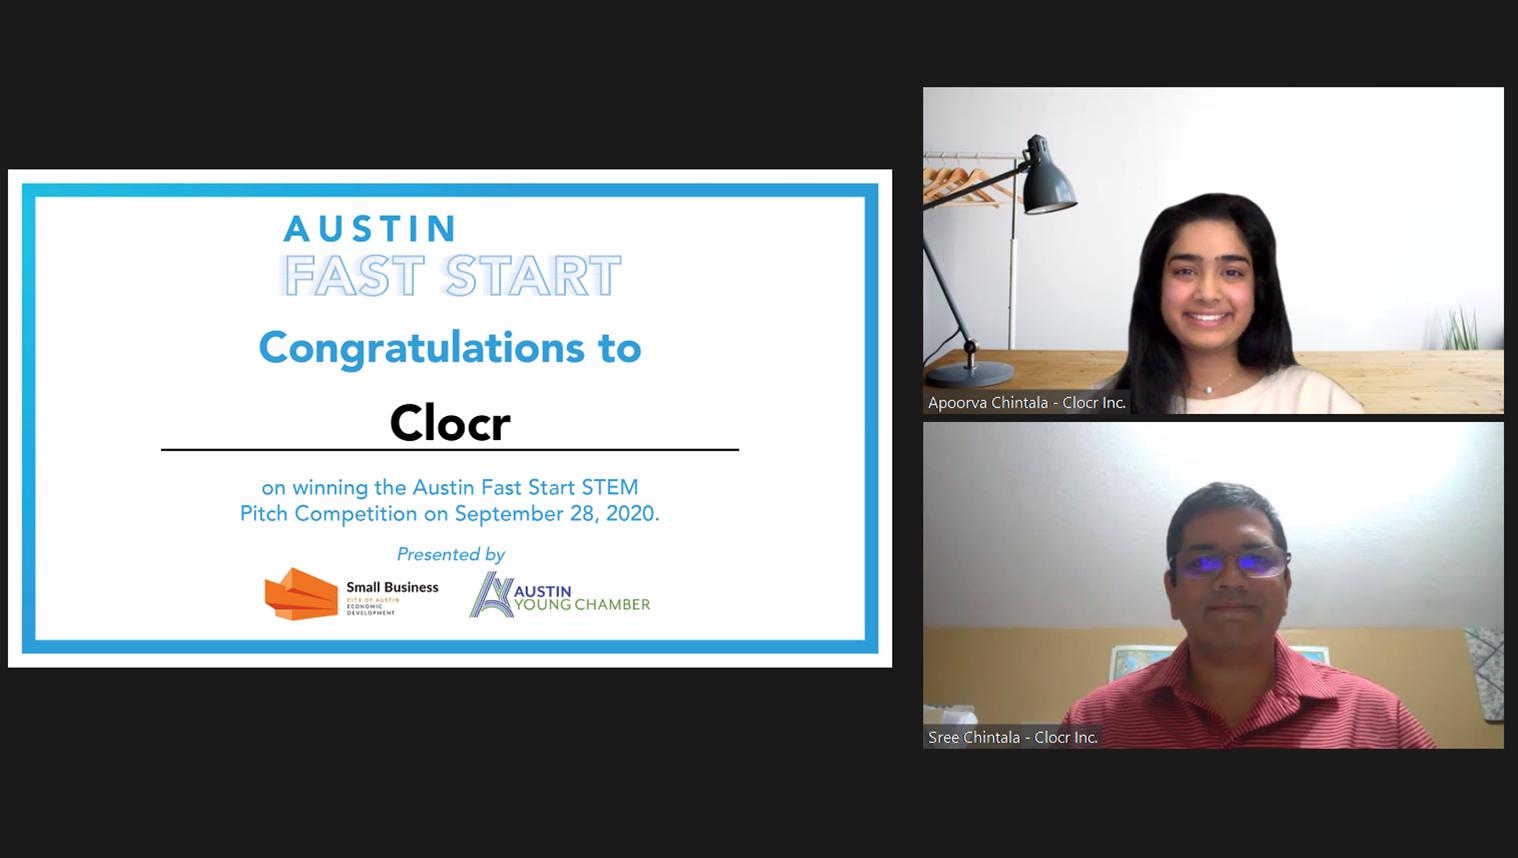 austinFastStart-clocr